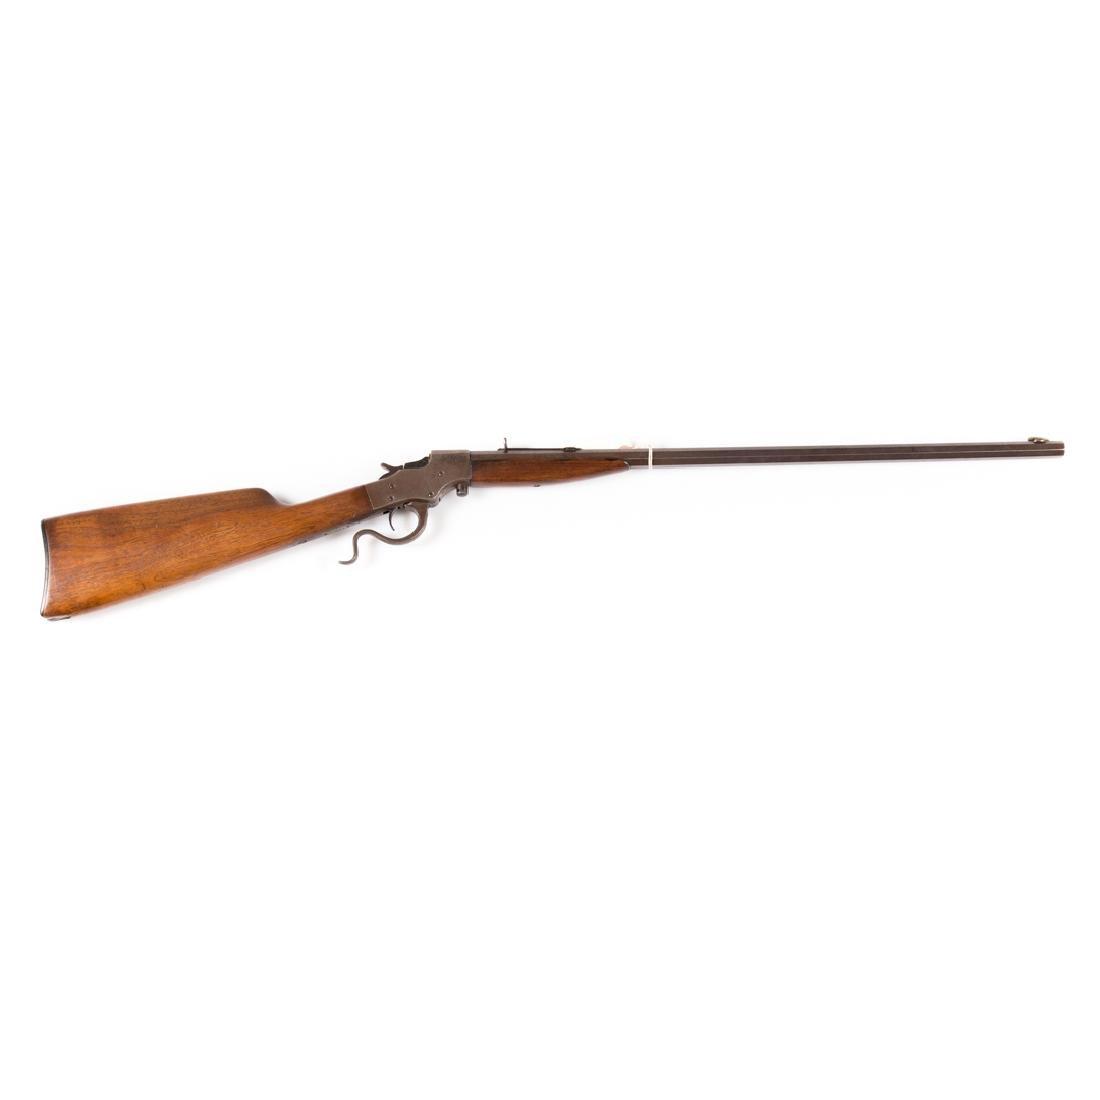 J. Stevens Lever Action Rifle